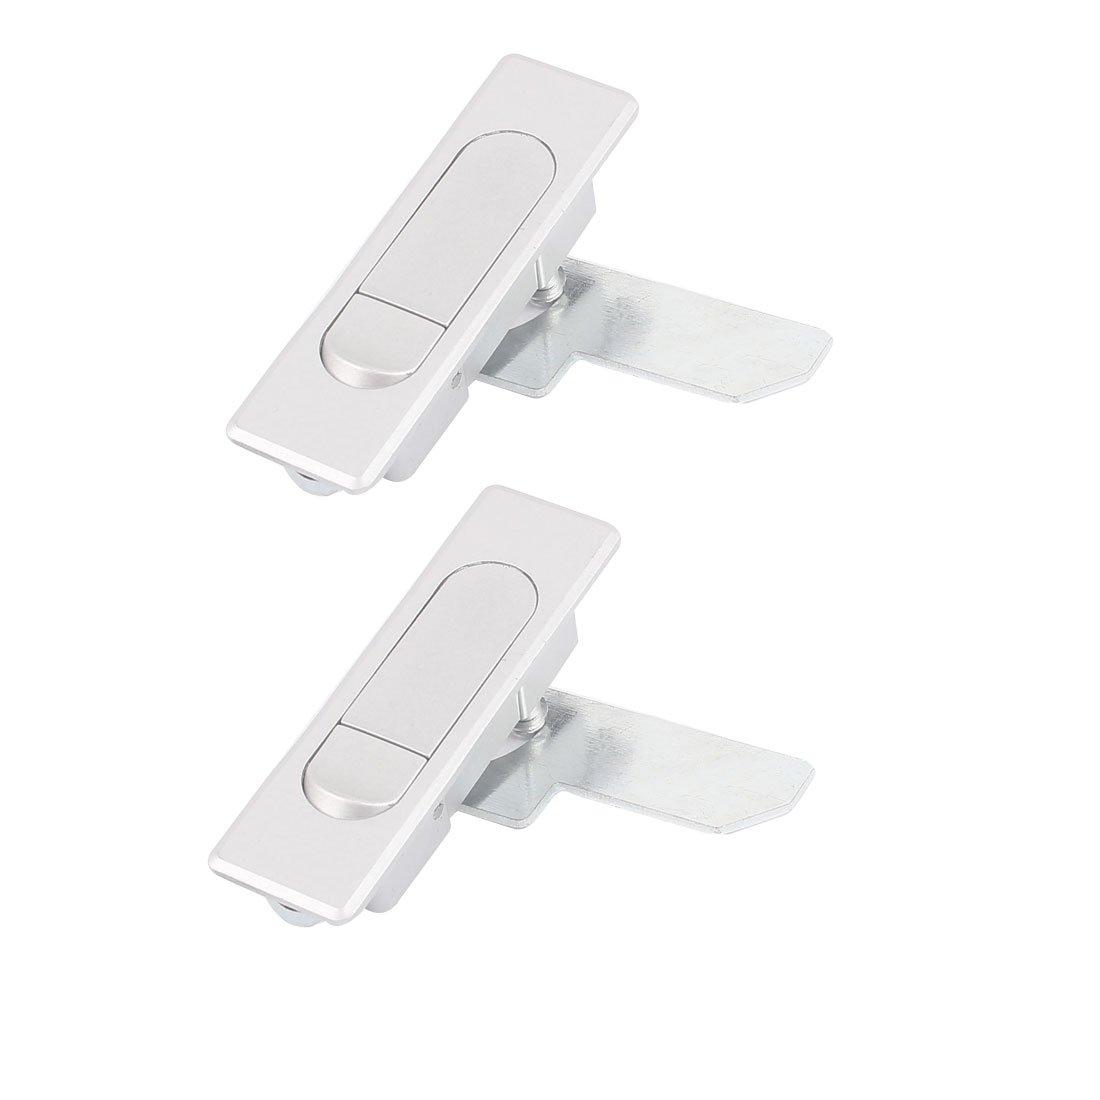 uxcell 2Pcs Cabinet Door Push Button Pop Up Plane Type Cam Lock Silver Tone